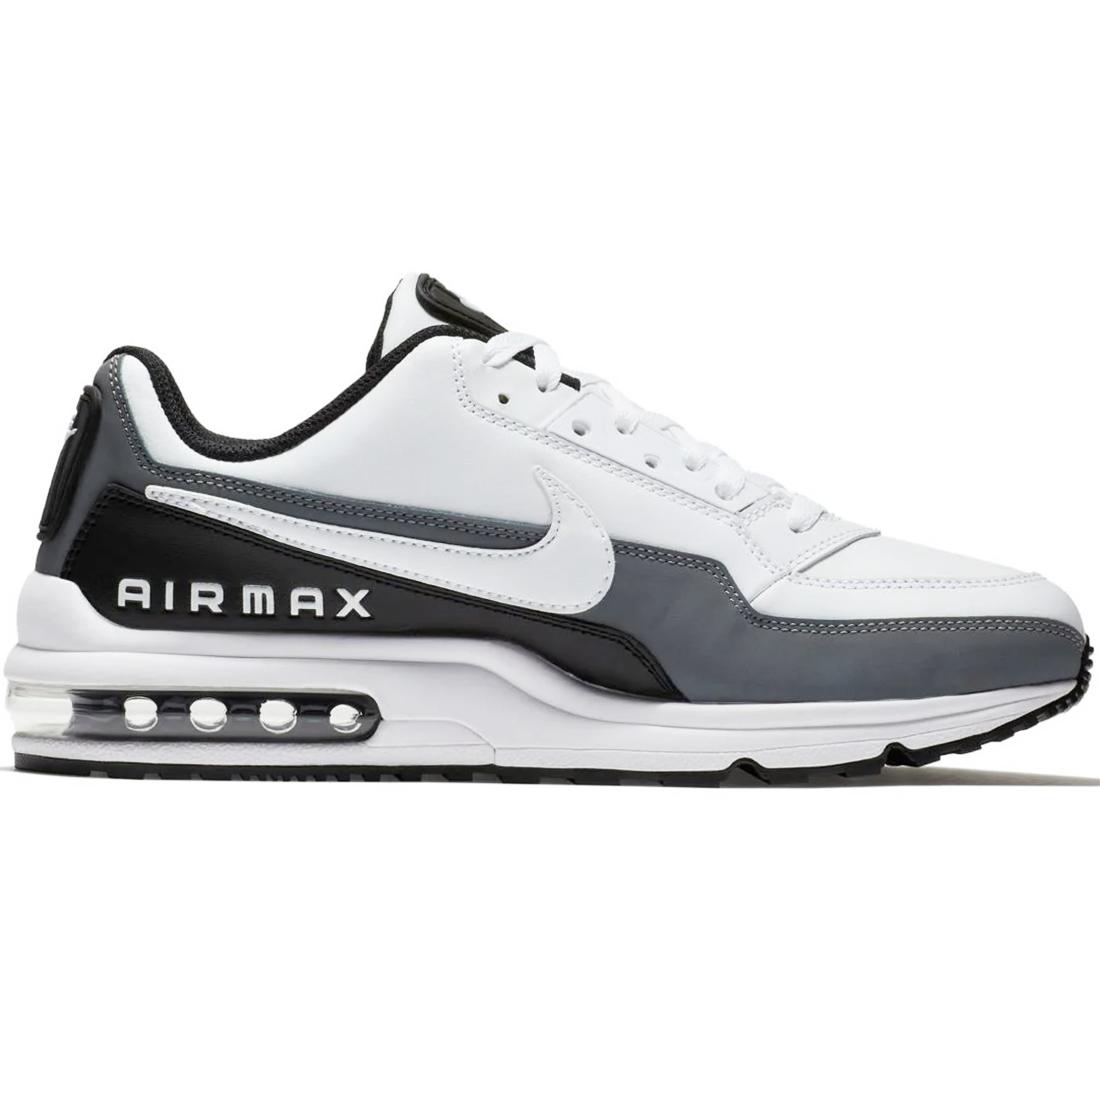 Nike Air Max LTD 3 Sneaker weiß schwarz grau